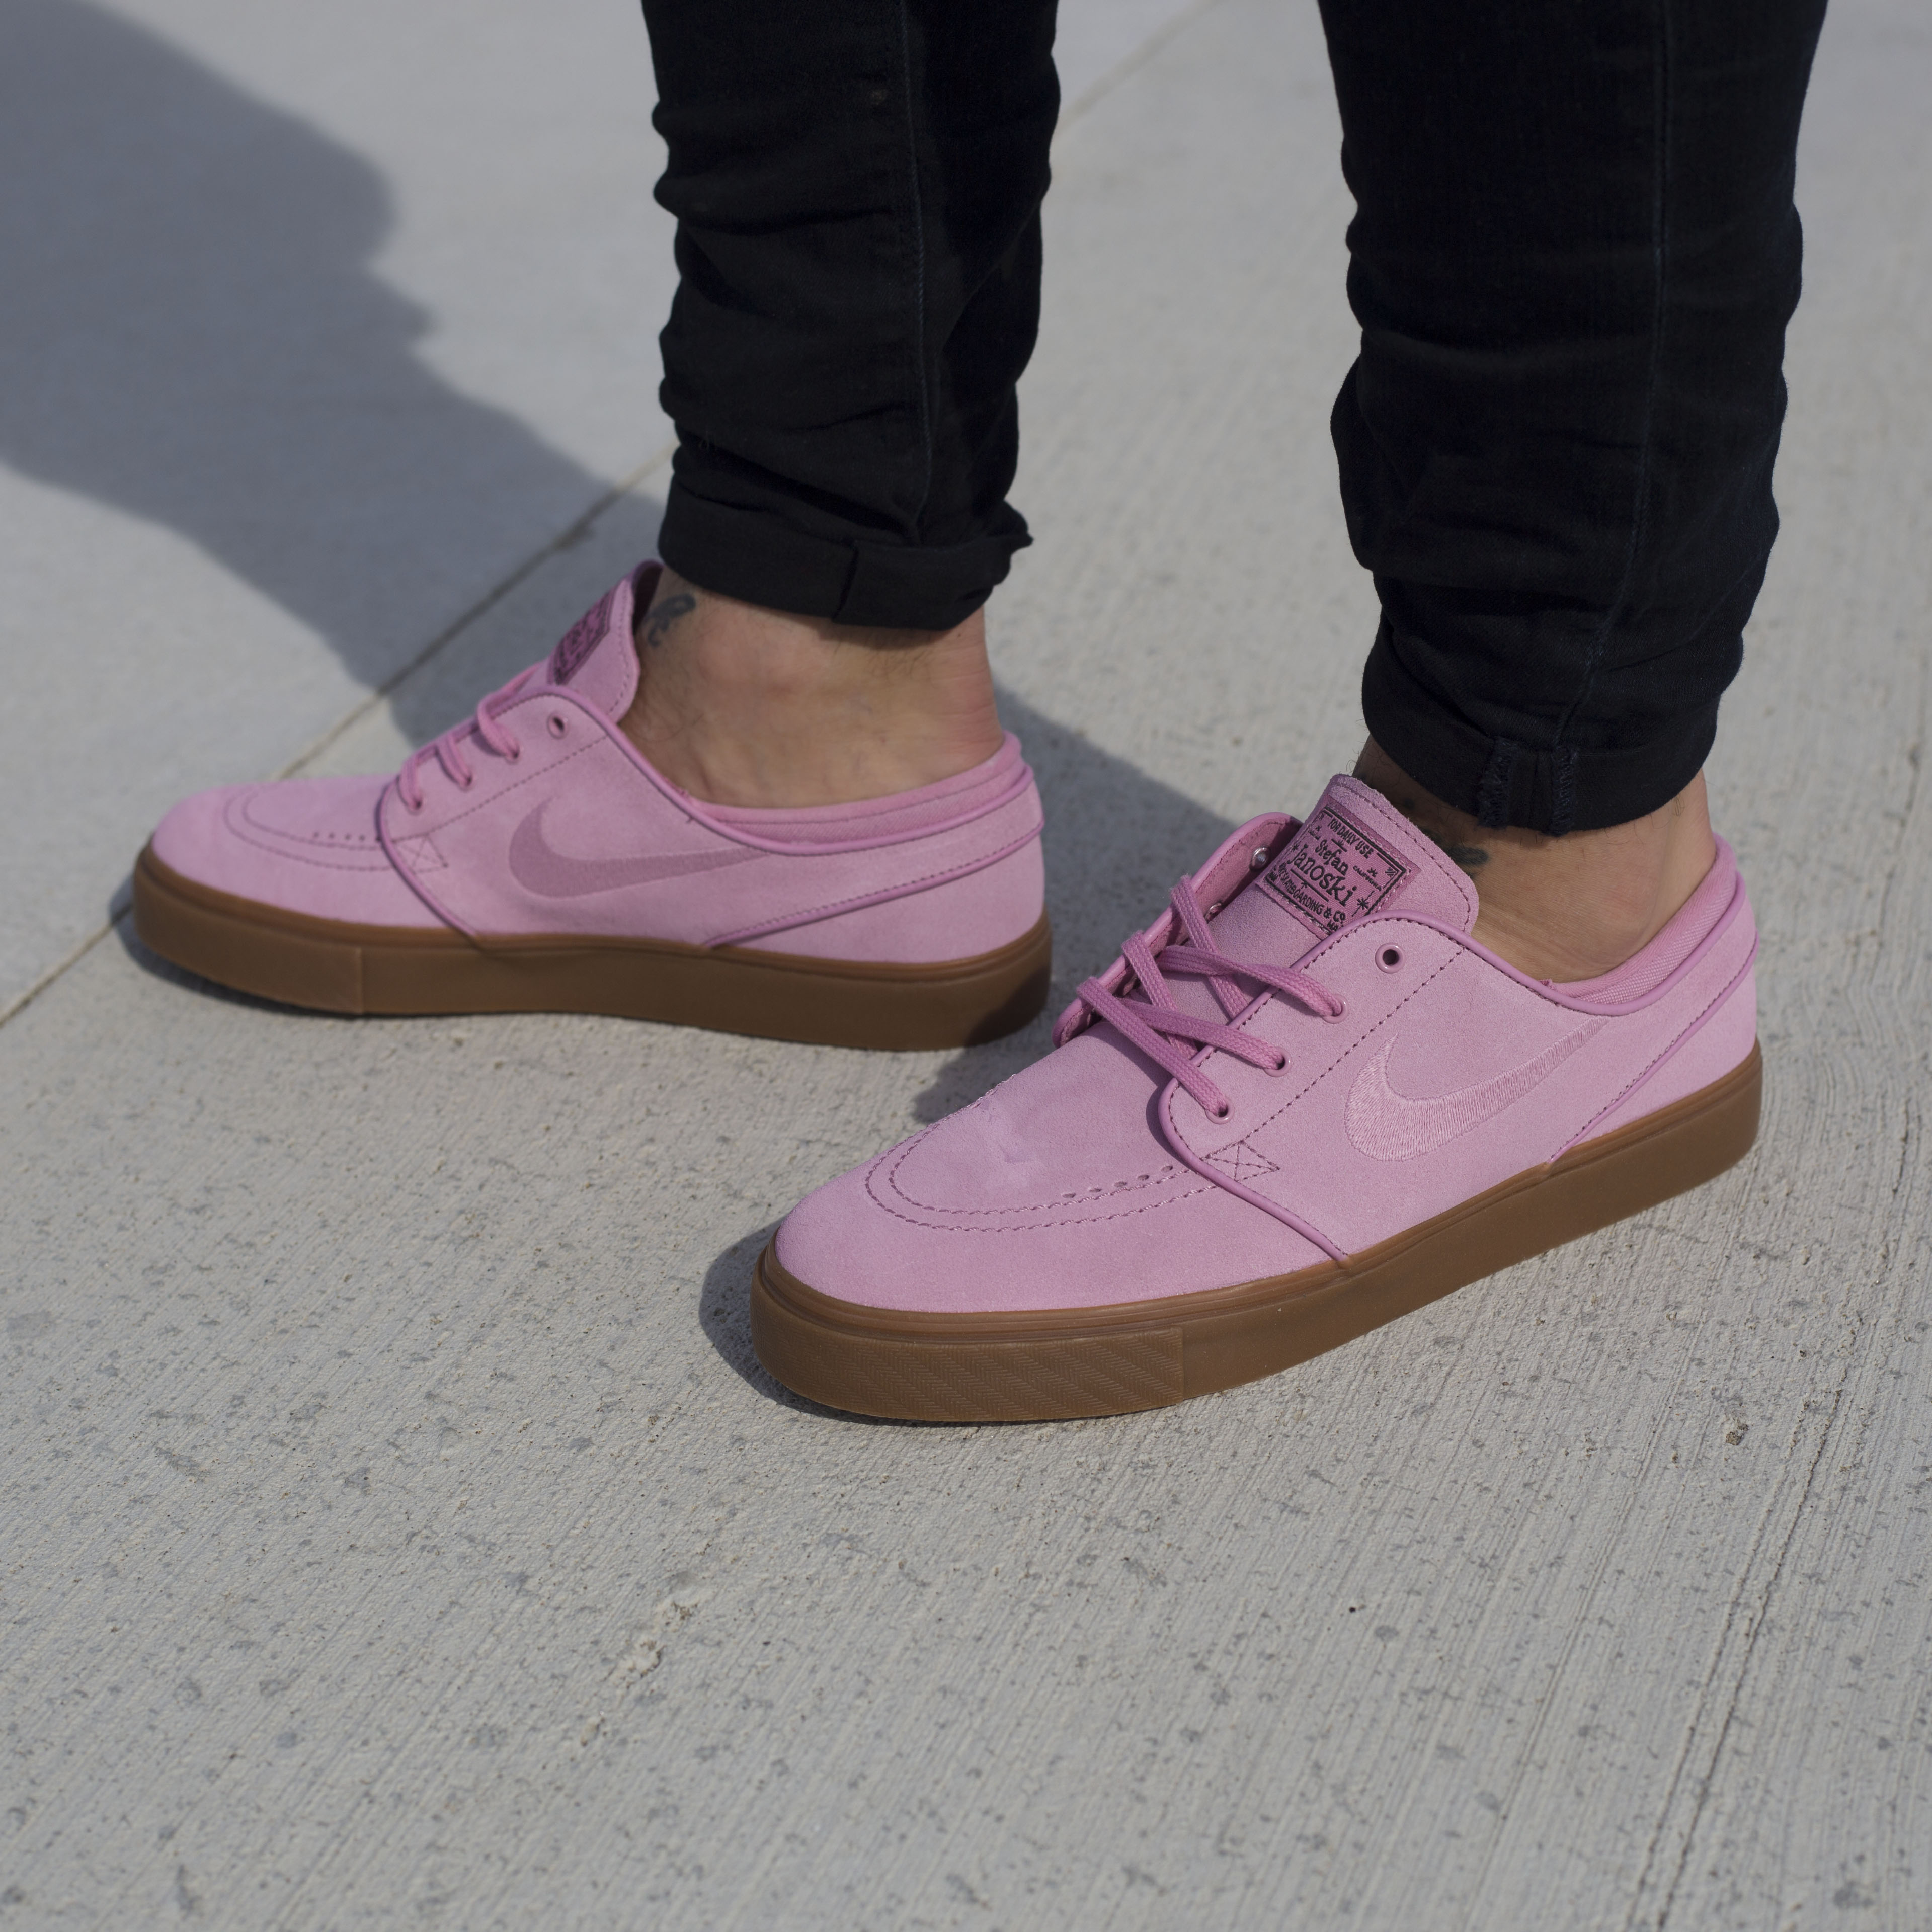 0d5916ffc8c Nuevas zapatillas Nike Zoom Stefan Janoski Elemental Pink - Dacks ...